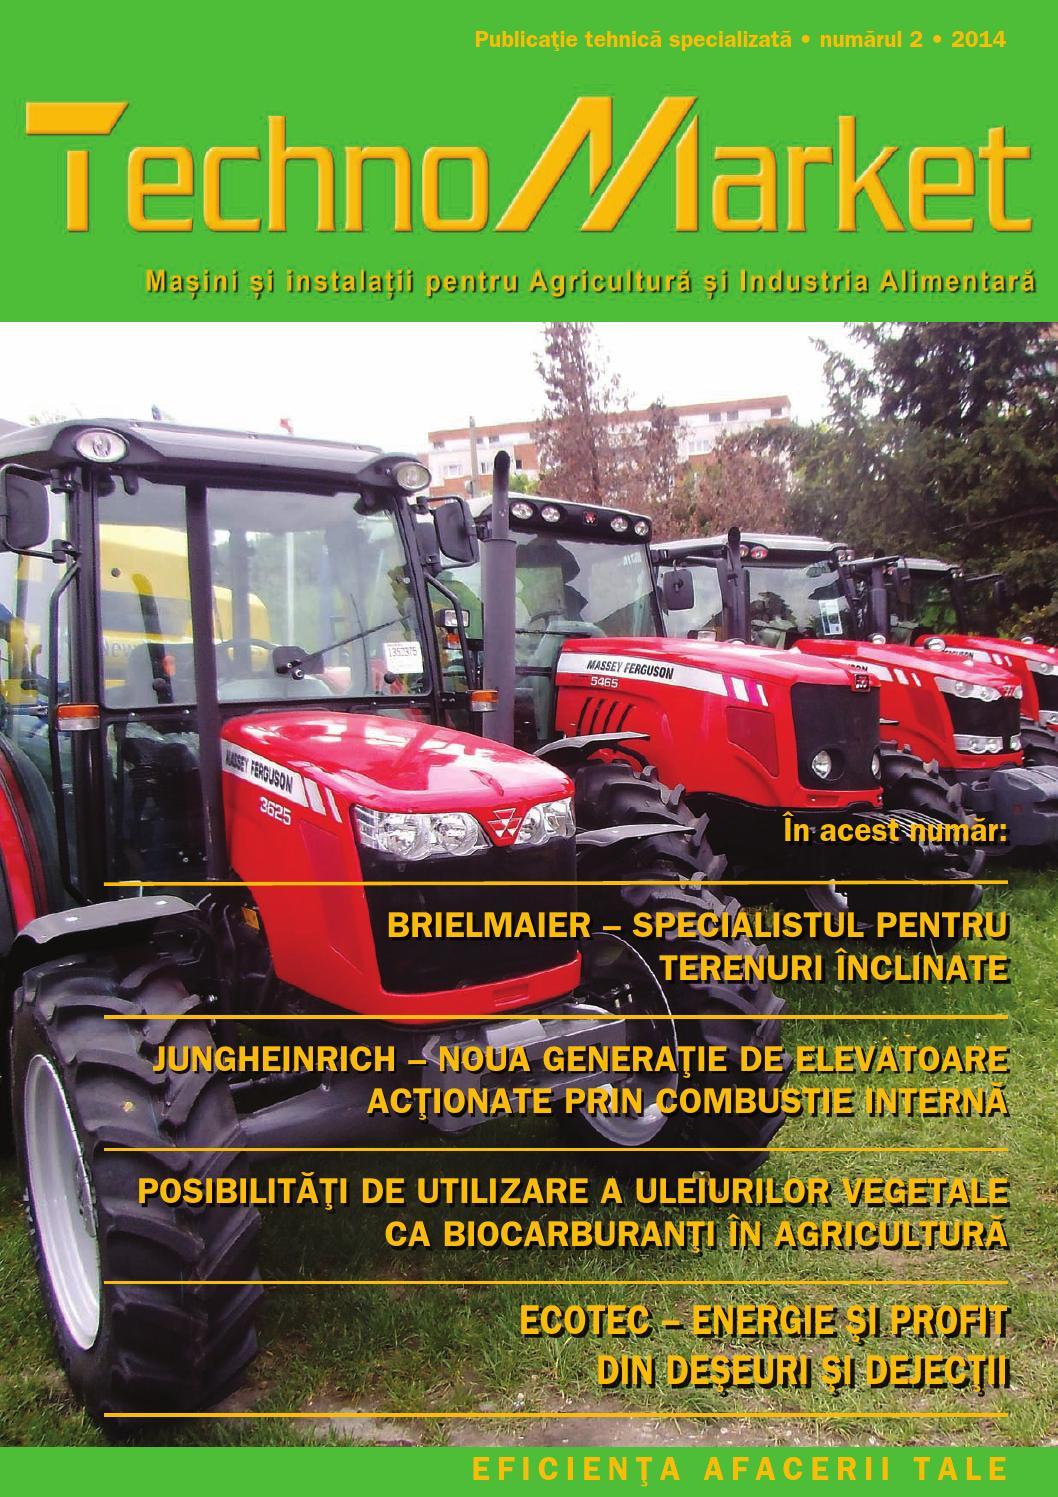 Bovis magazin 38 versiune electronica by BOVISmagazin - Issuu